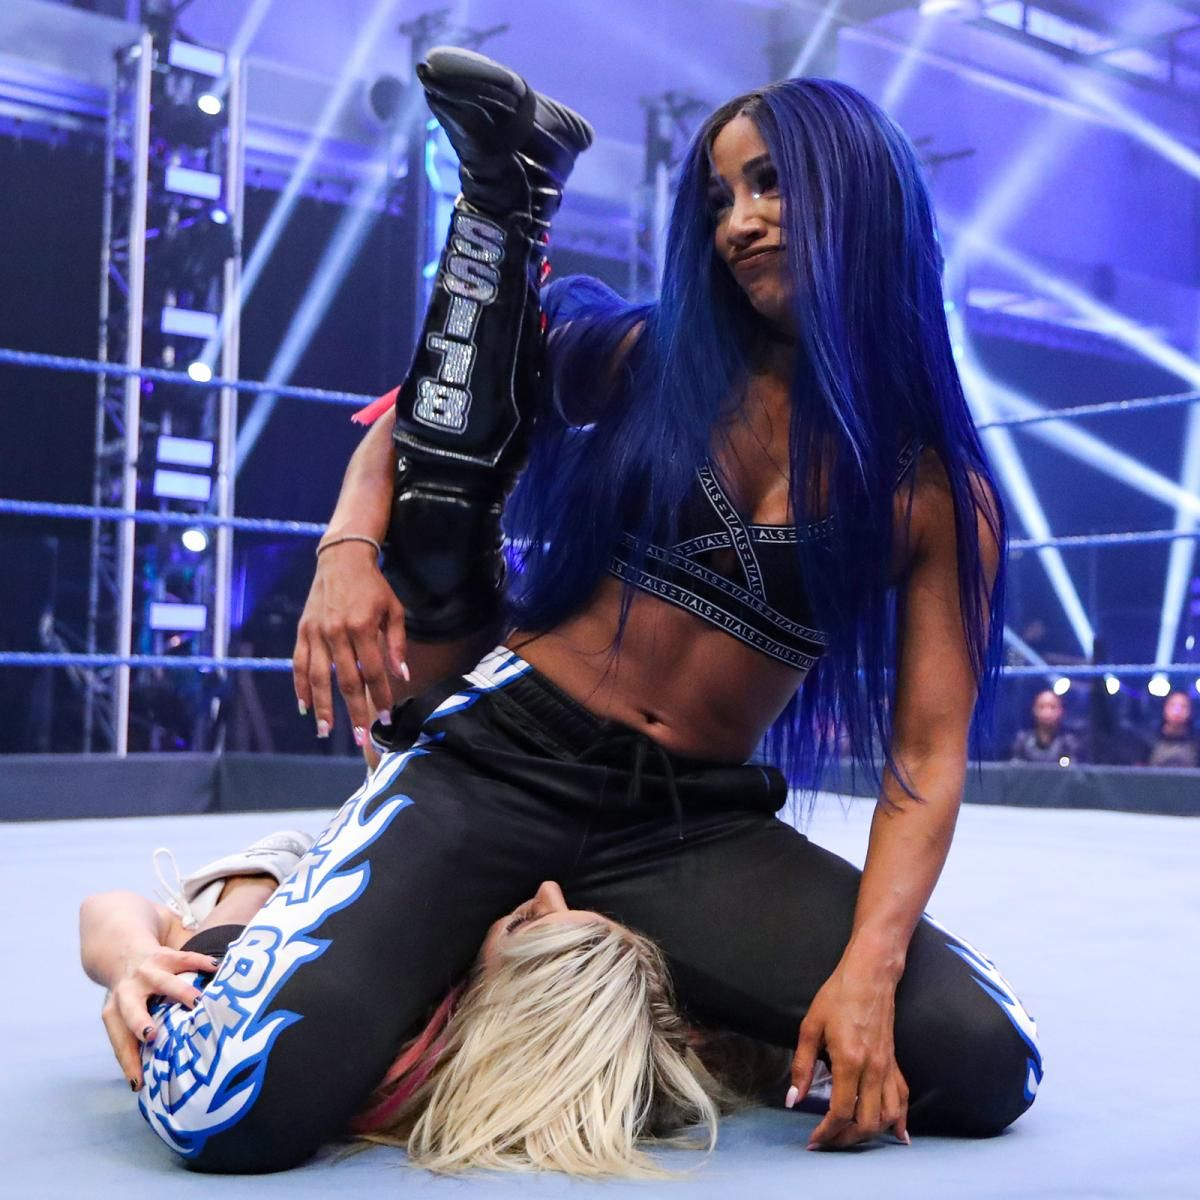 WWE Star Sasha Banks Wants To Produce An All-Women Show 1